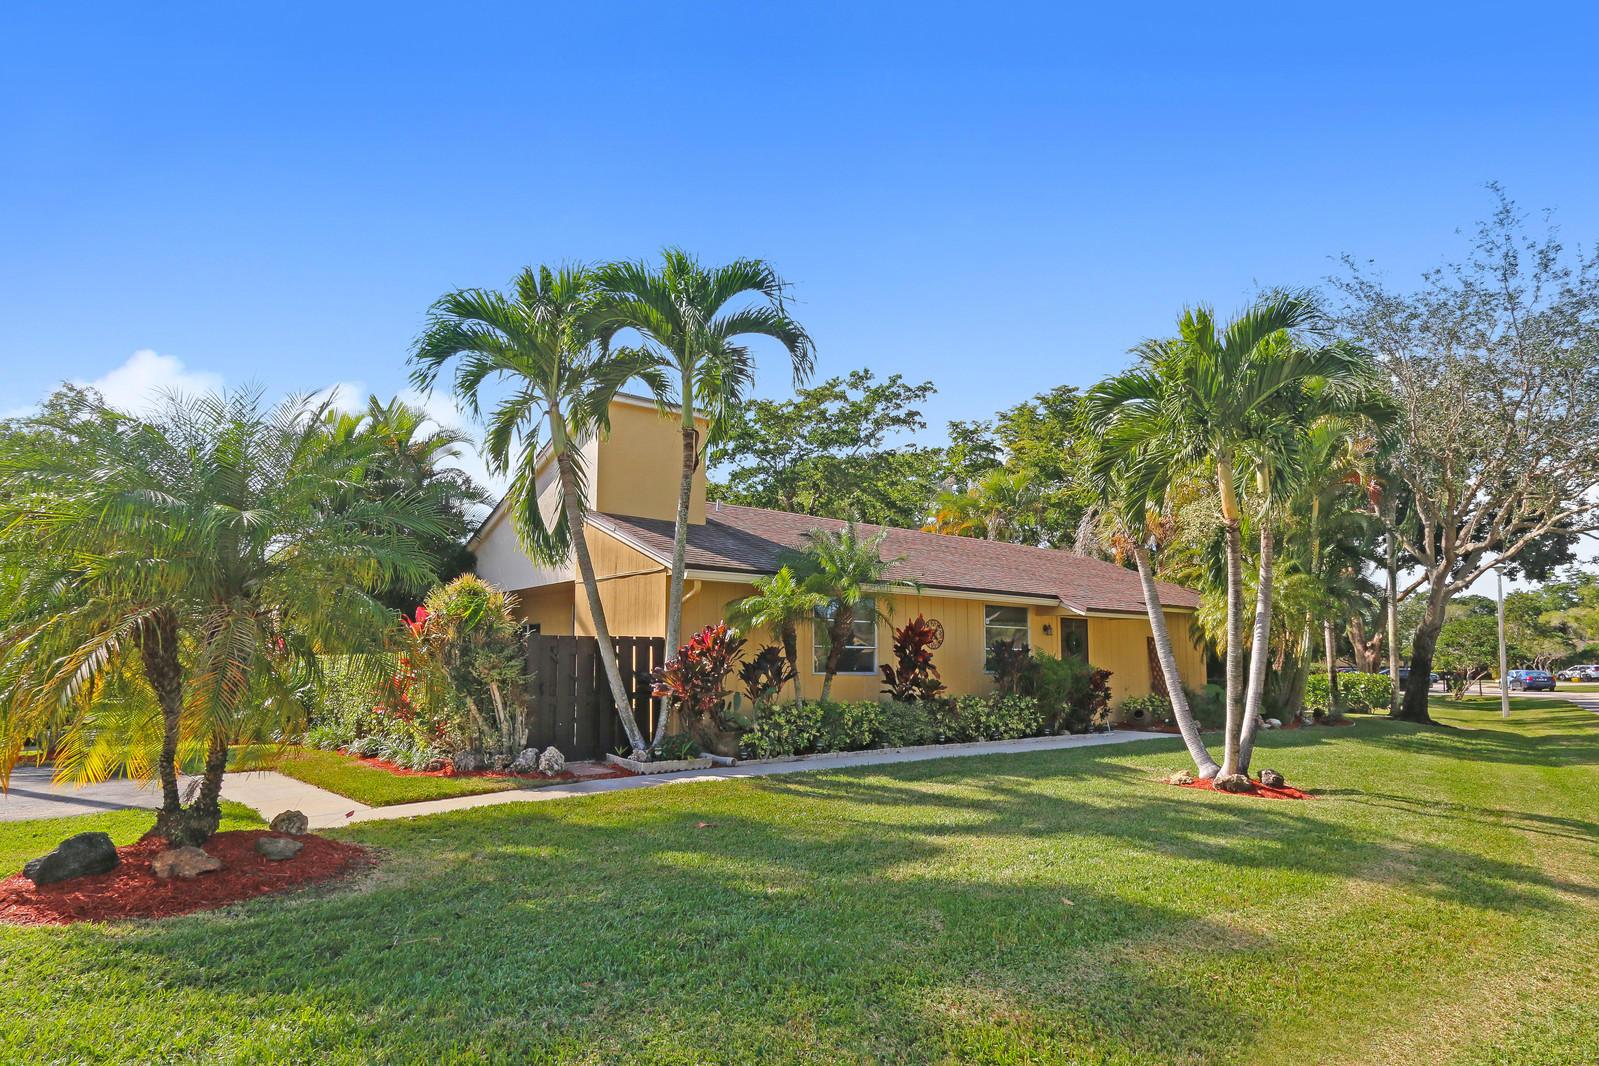 11698 Timbers Way Boca Raton, FL 33428